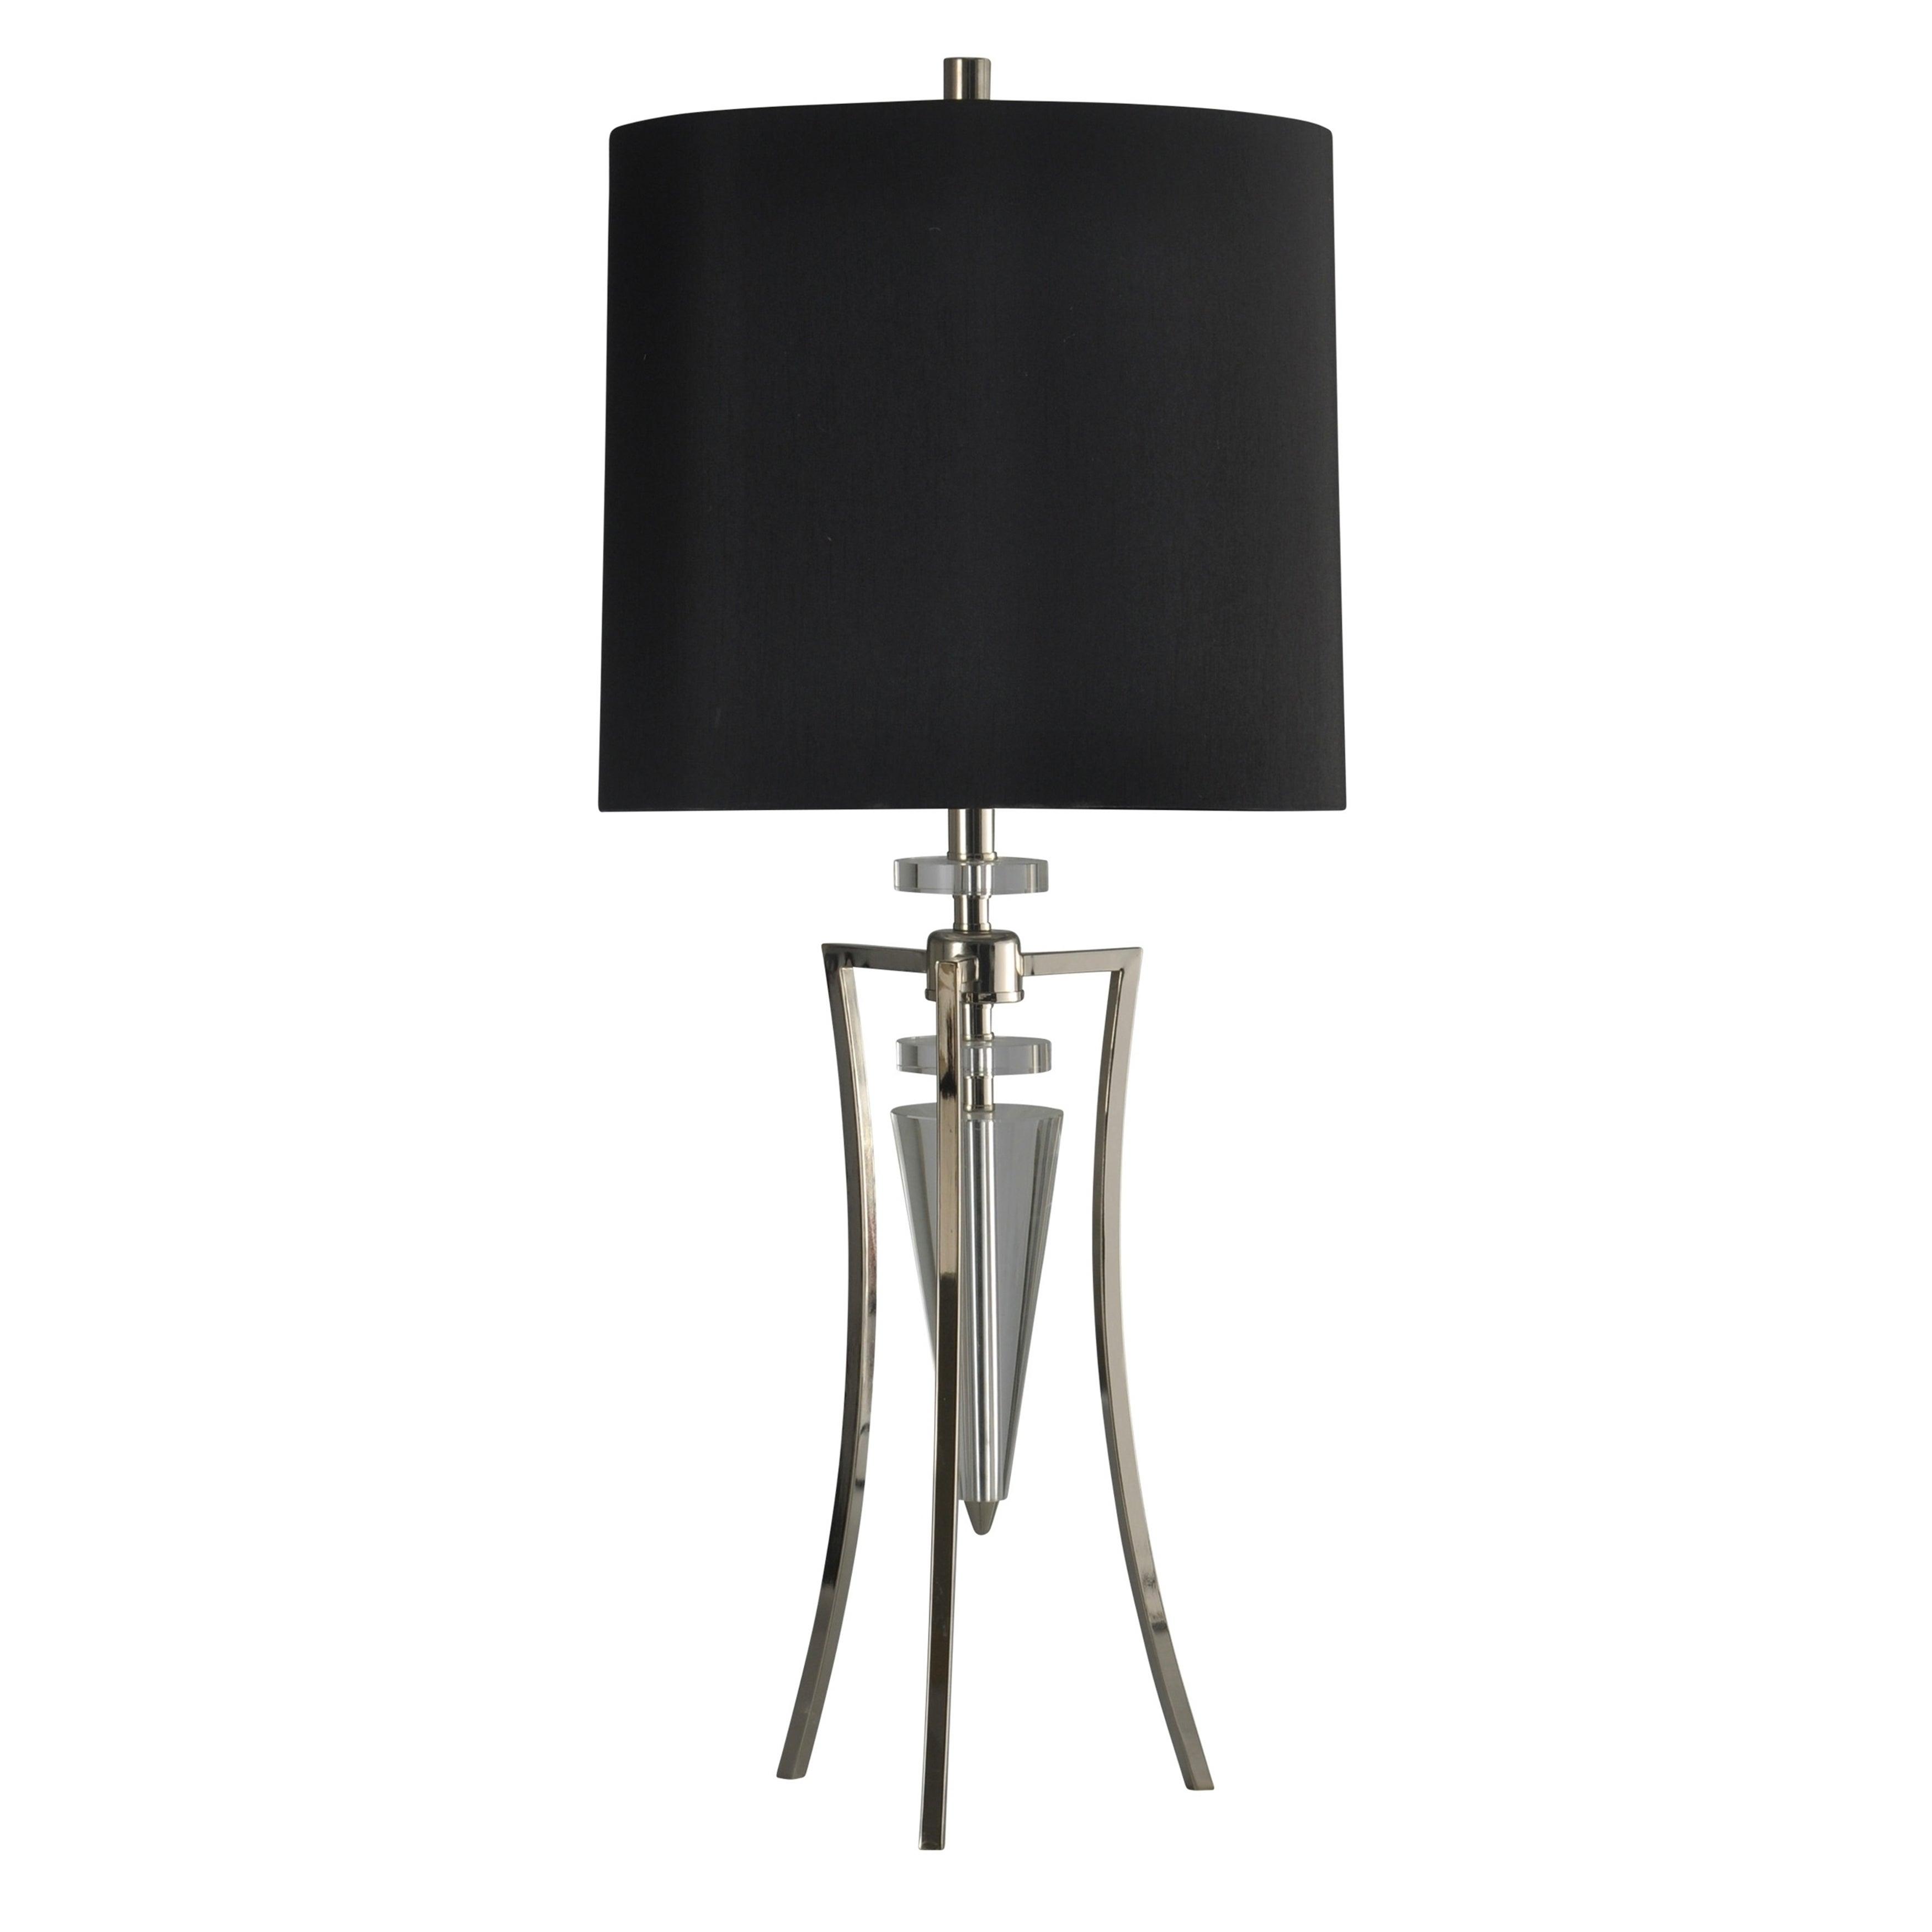 Shop Crystal Table Lamp Black Hardback Fabric Shade Free